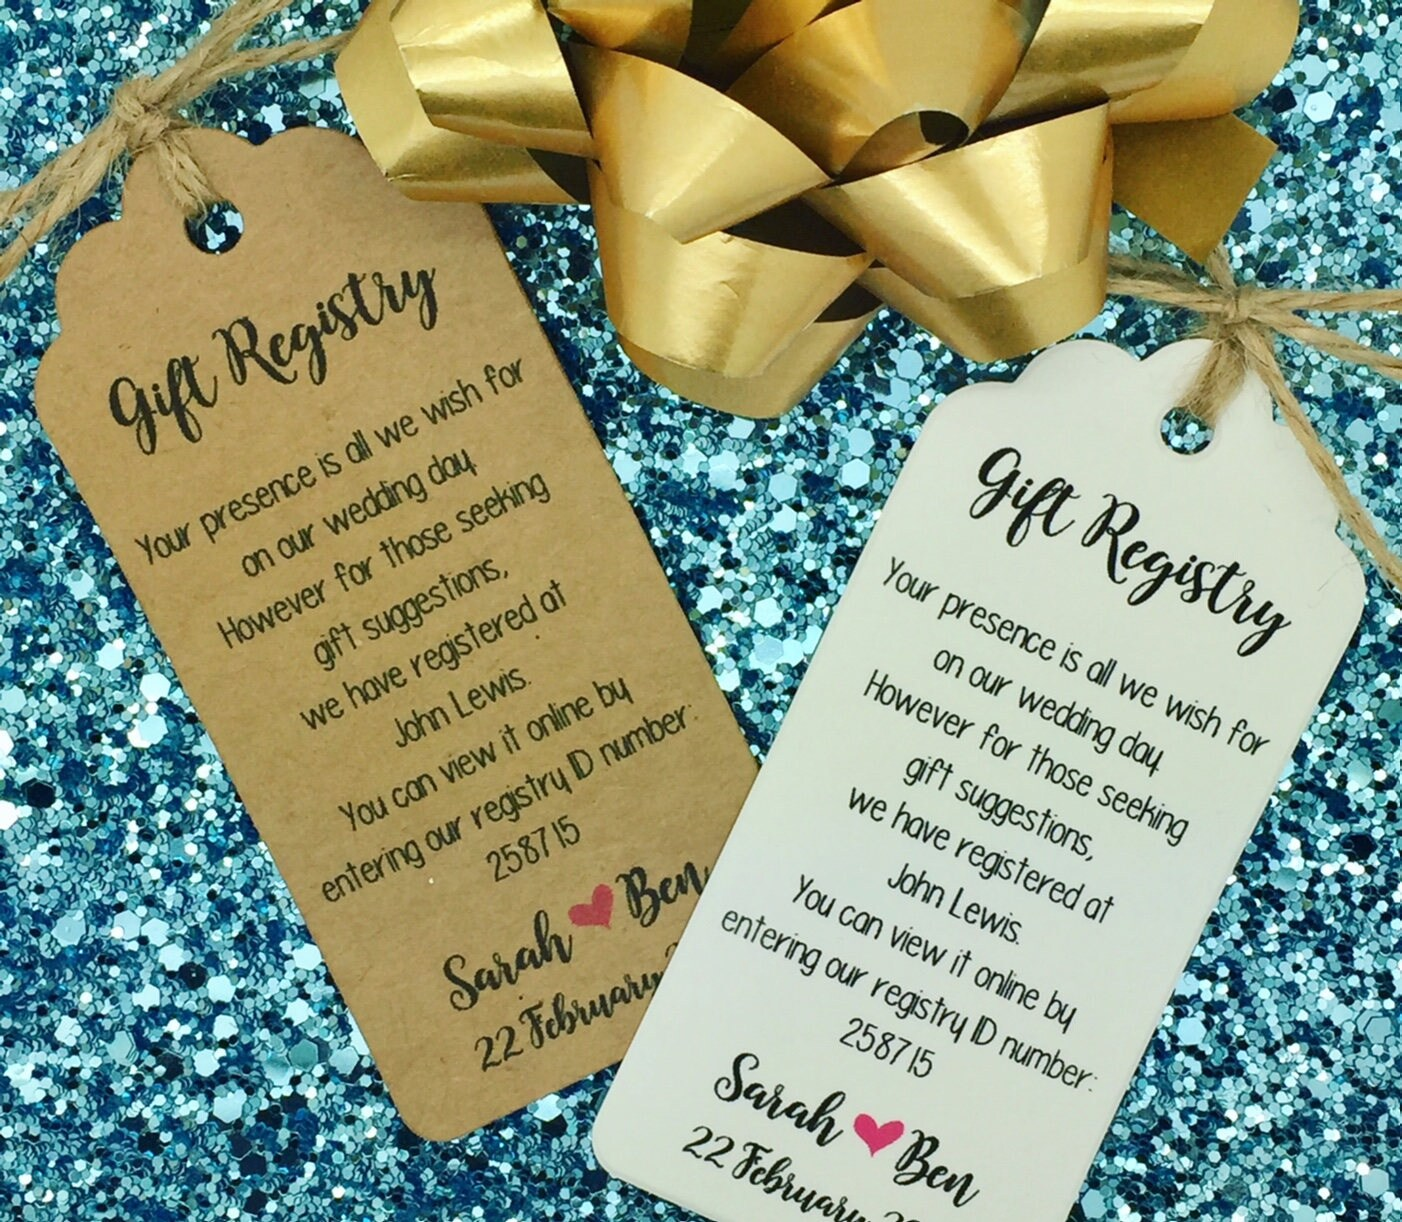 Wedding Cash Gift Registry: Wedding Gift Registry Wishing Well Card Money Request Poem